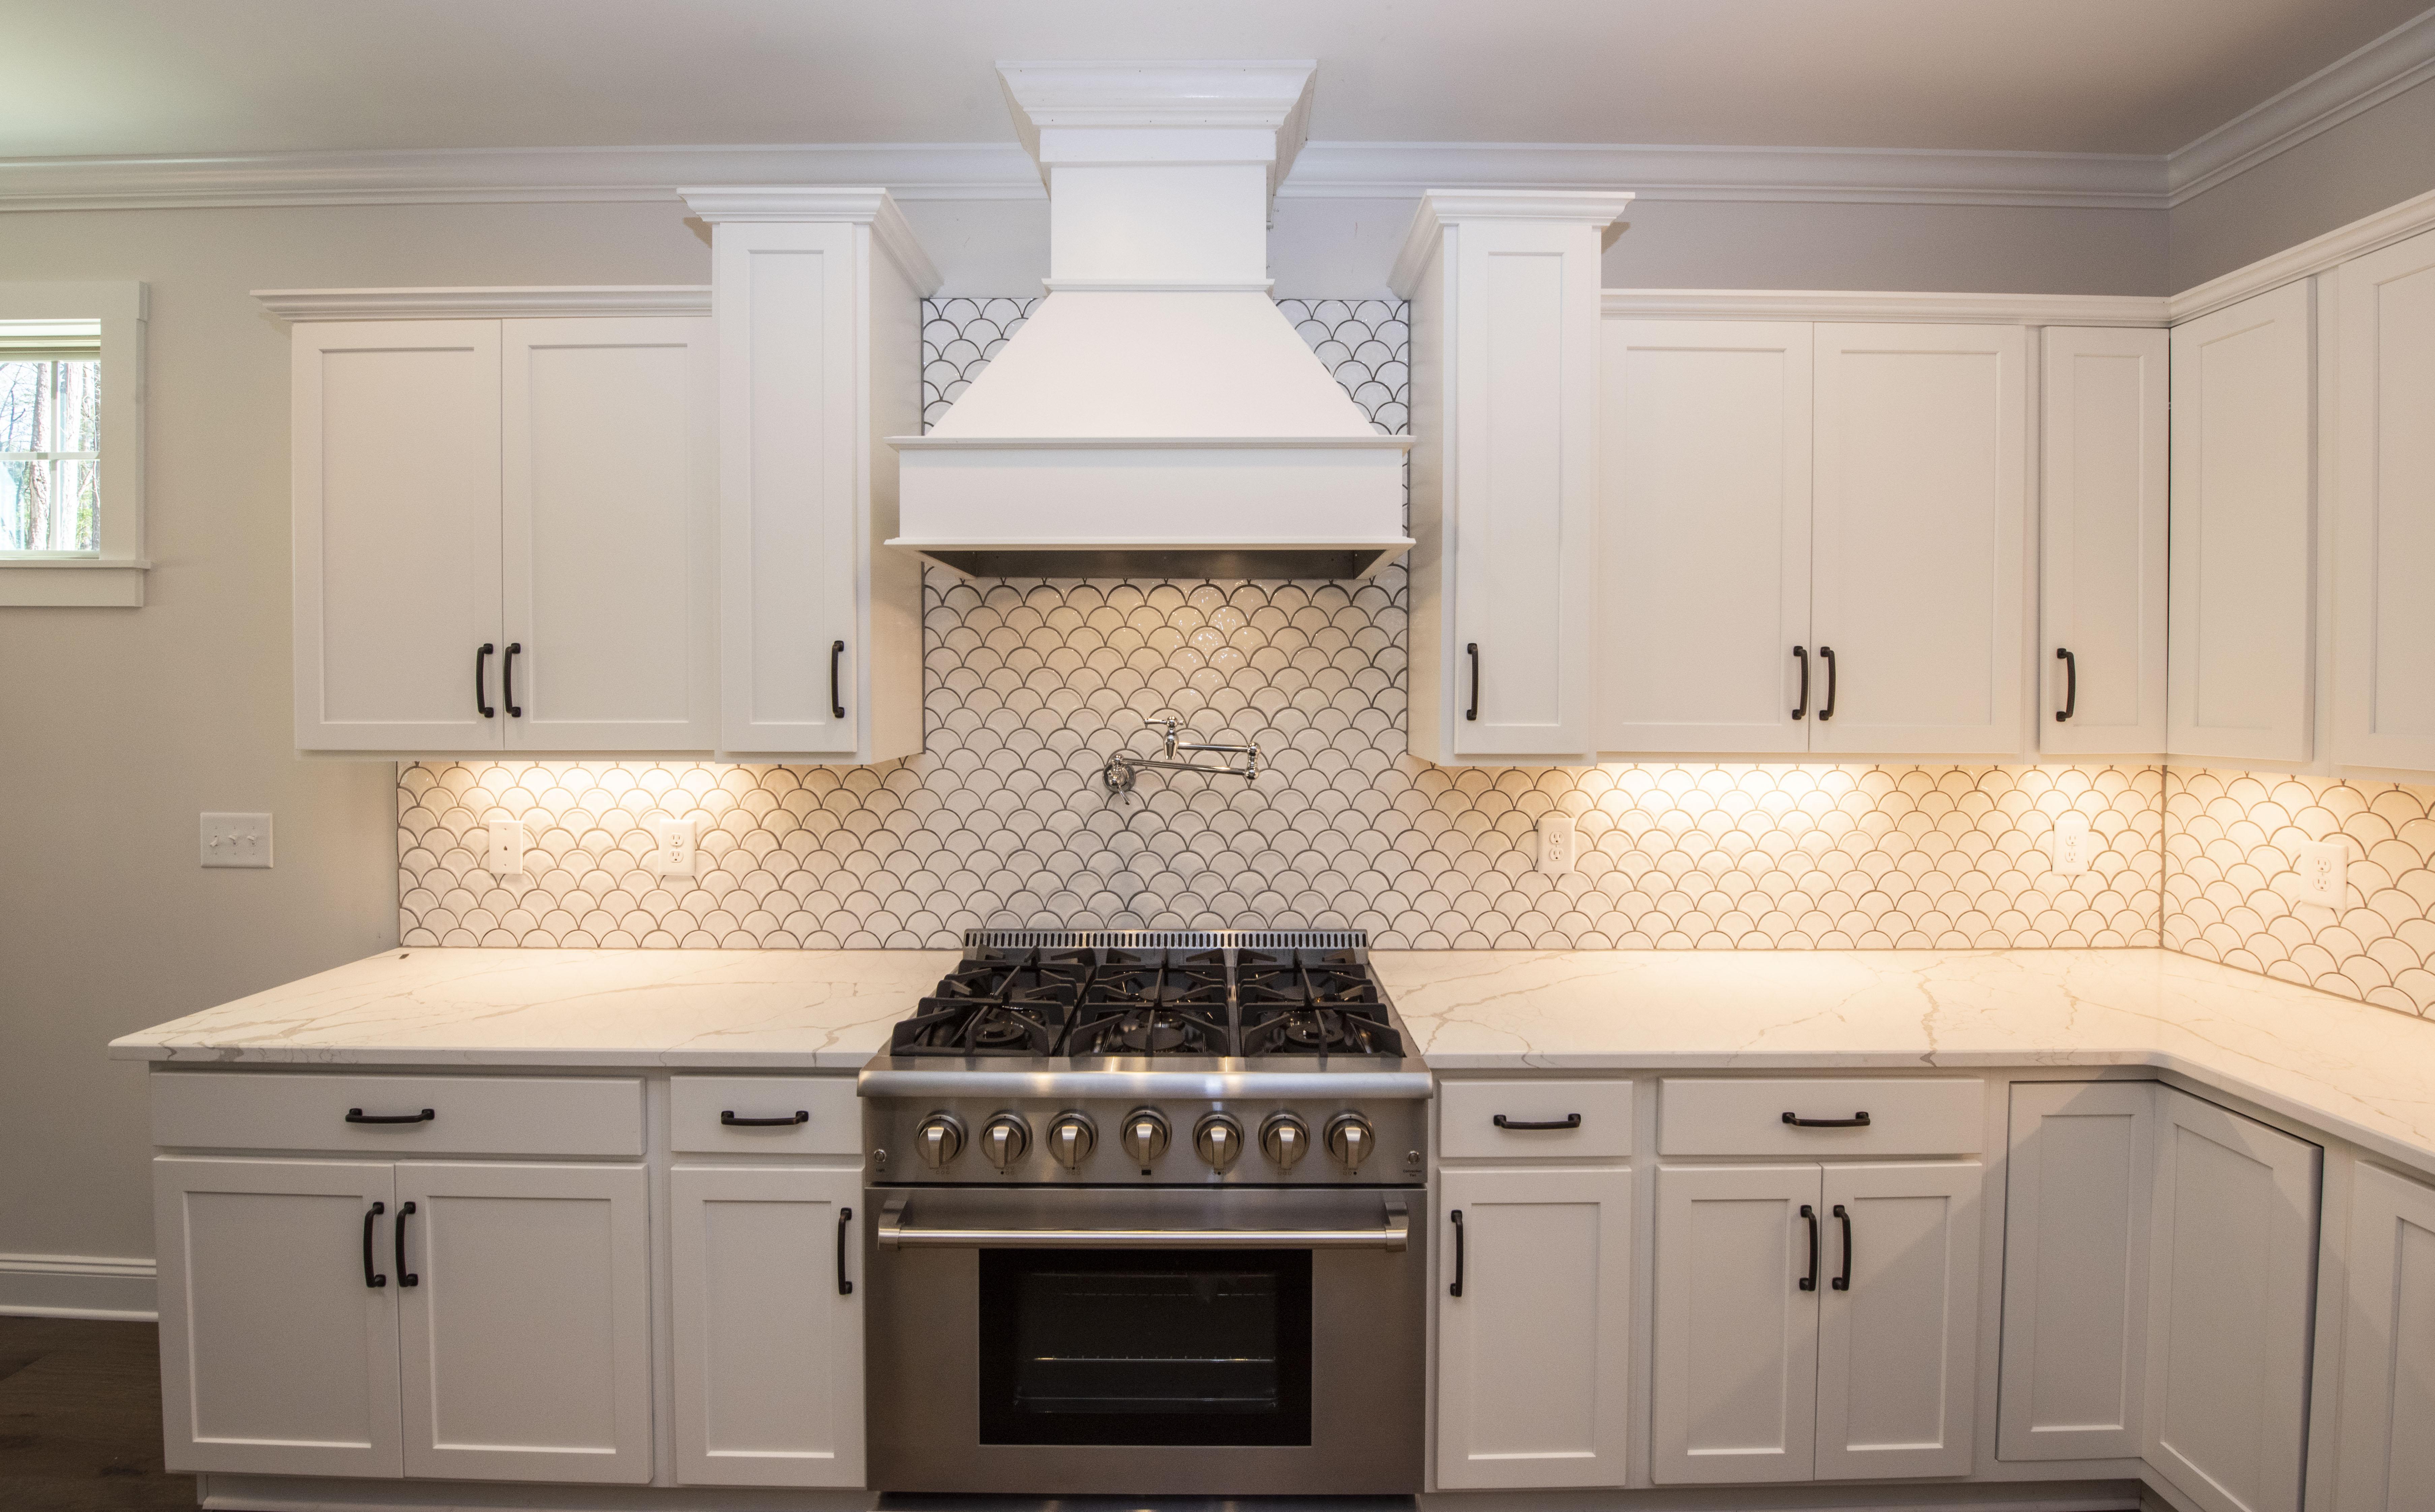 Kitchen featured in The Hayden By Eastbrook Homes Inc. in Auburn-Opelika, AL